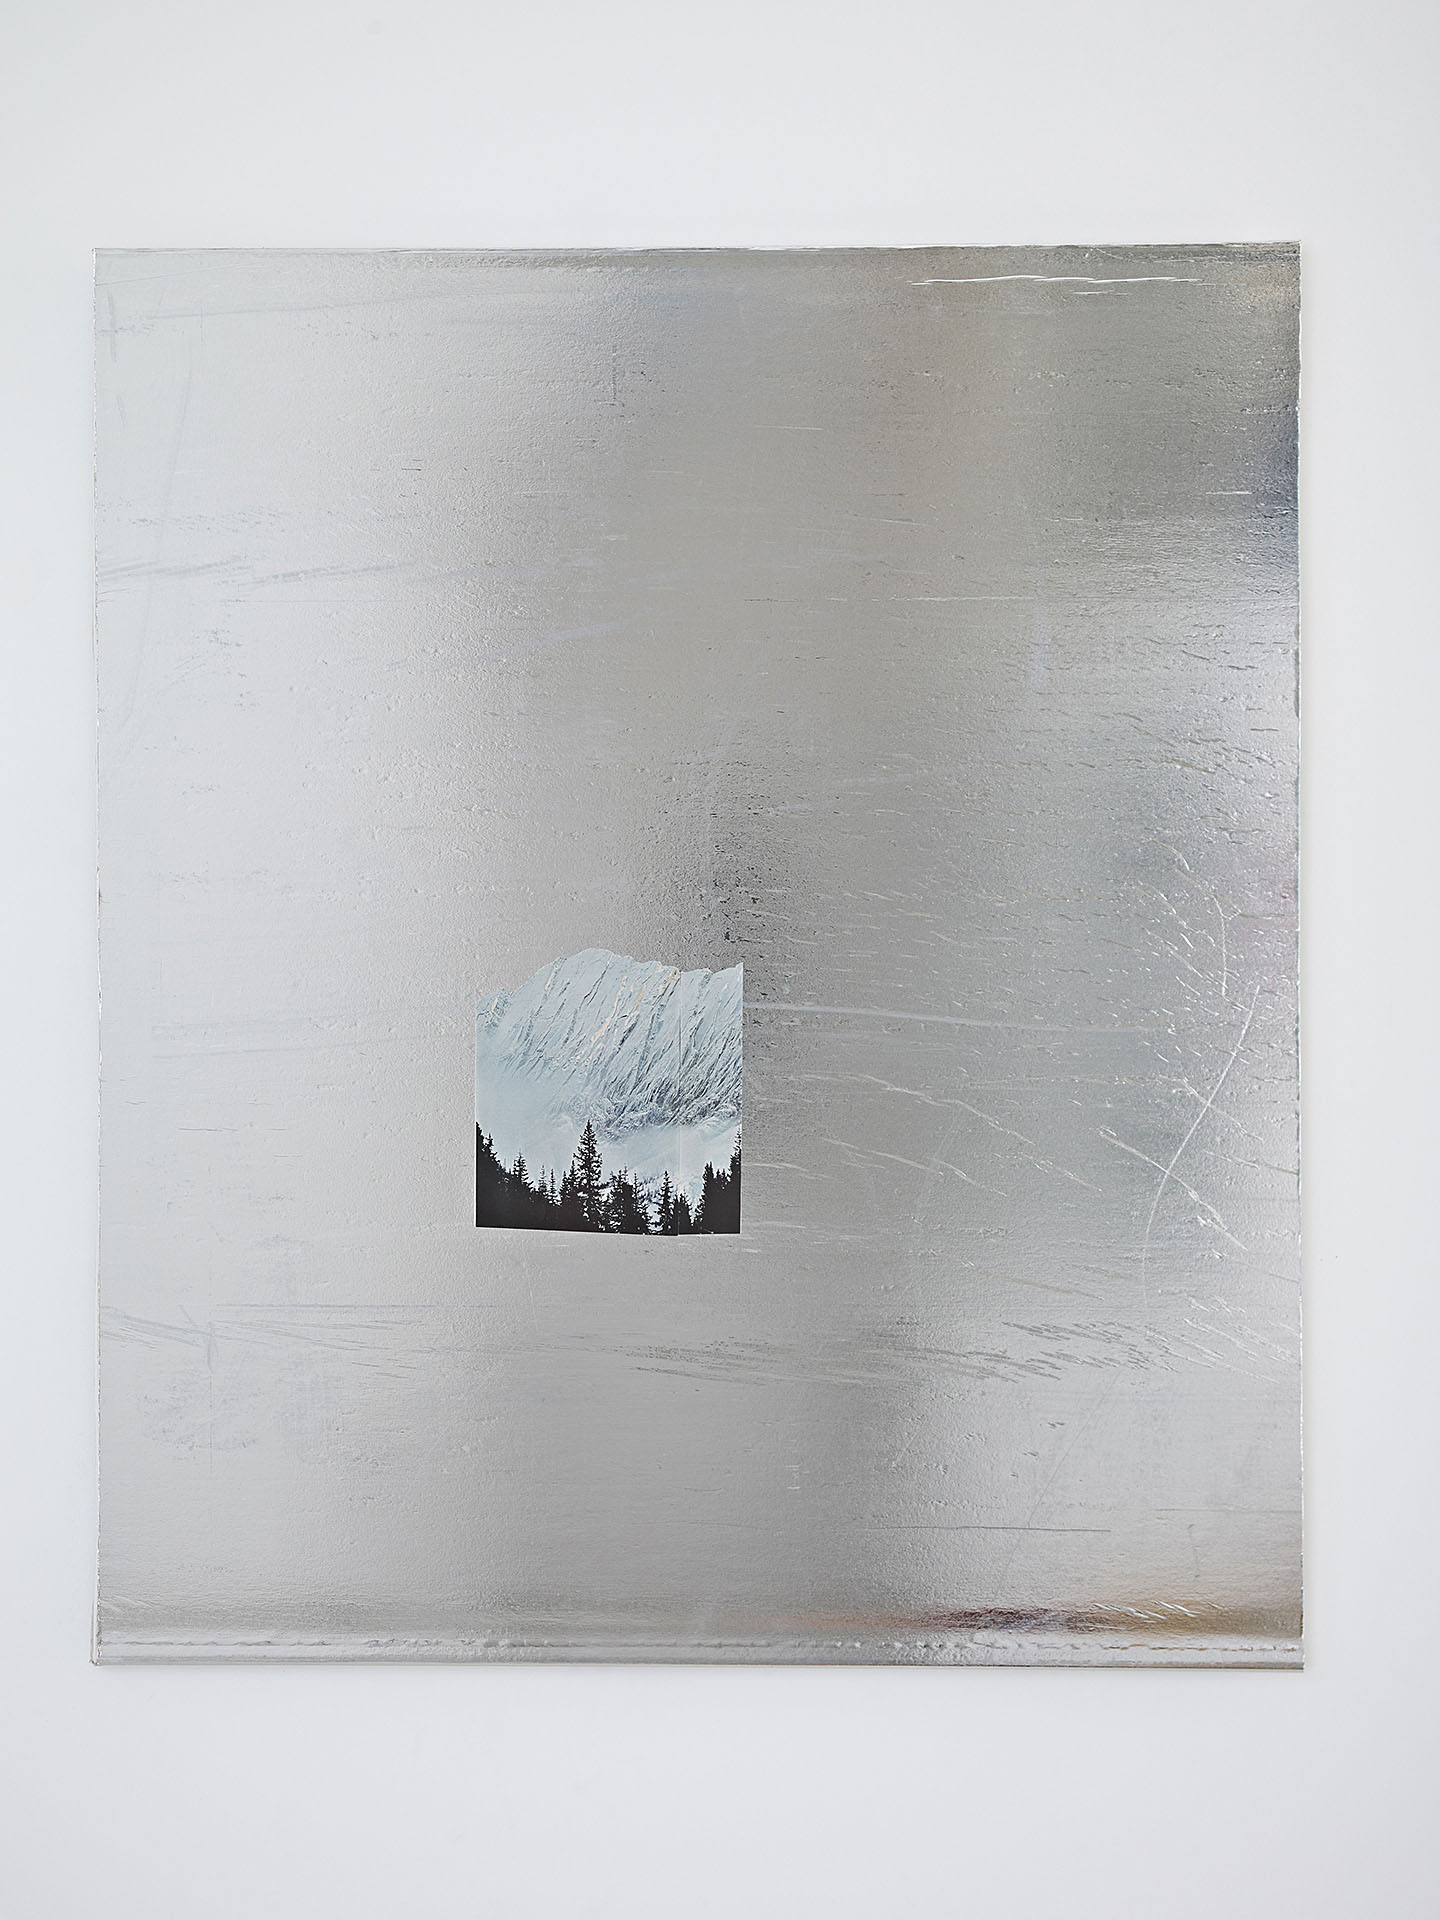 Merrick-Untitled-Wonderland-2013-02